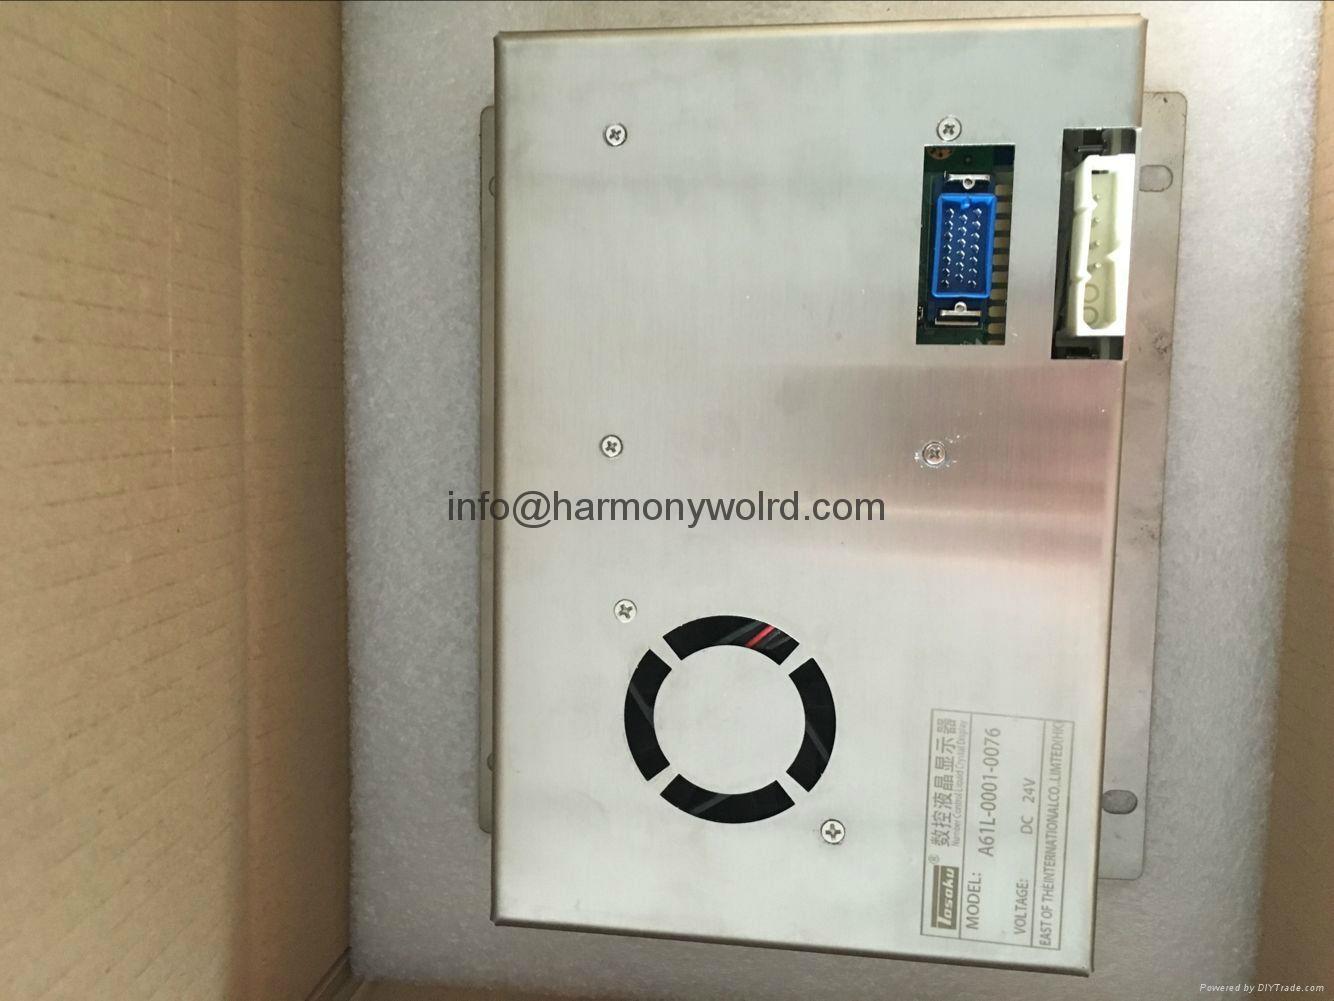 Upgrade A02B-0210-C111 FanucMonitor A02B-0222-C053 A02B-0236-B628 A02B-0247-B612 17